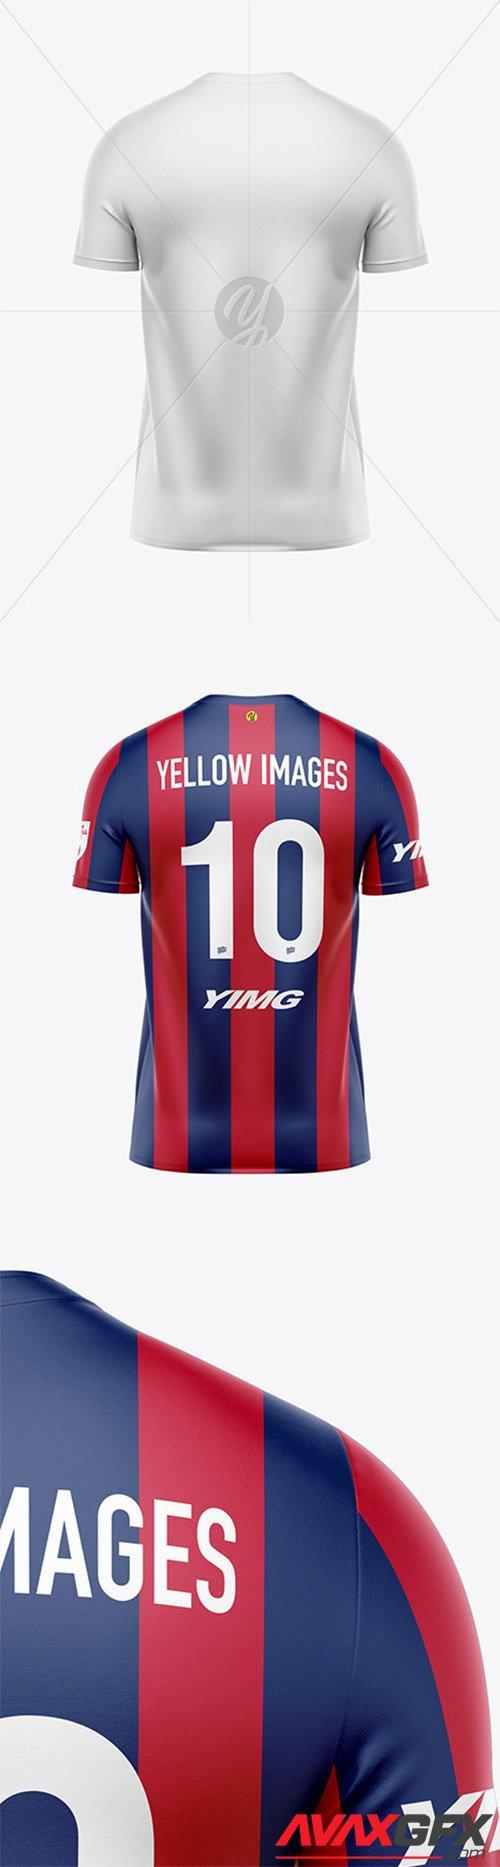 Download Men's Soccer Jersey Mockup 45923 » AVAXGFX - All Downloads ...